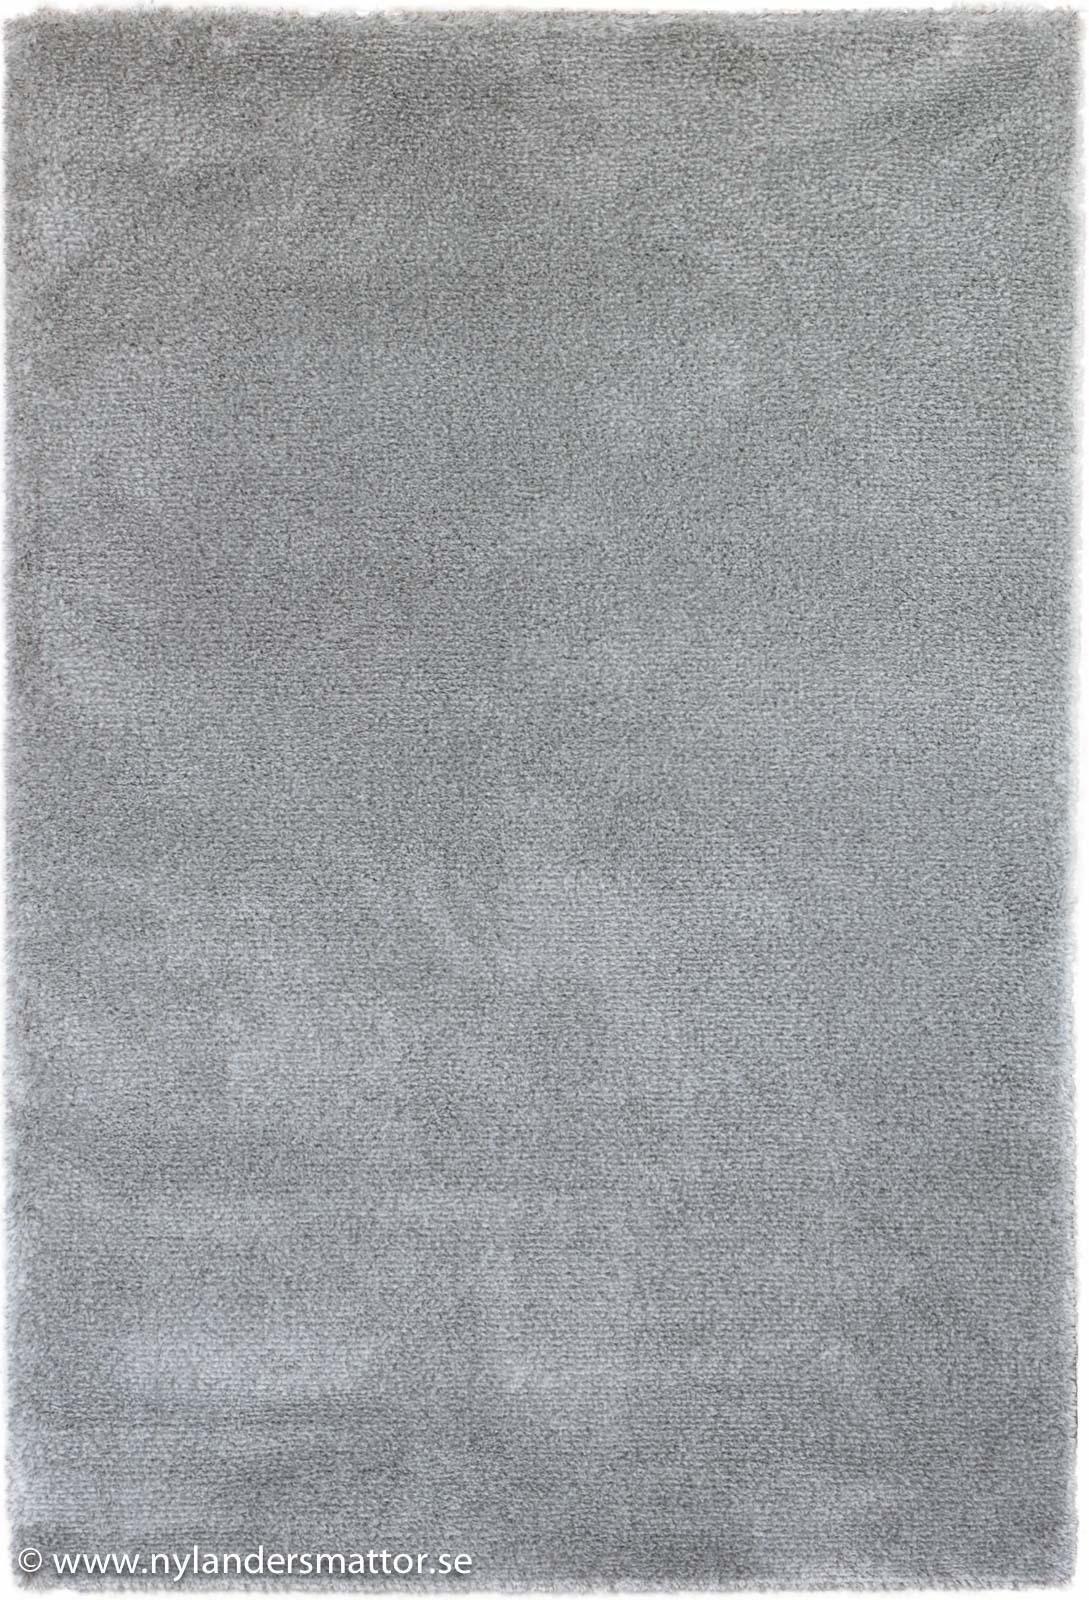 Ljusgrå